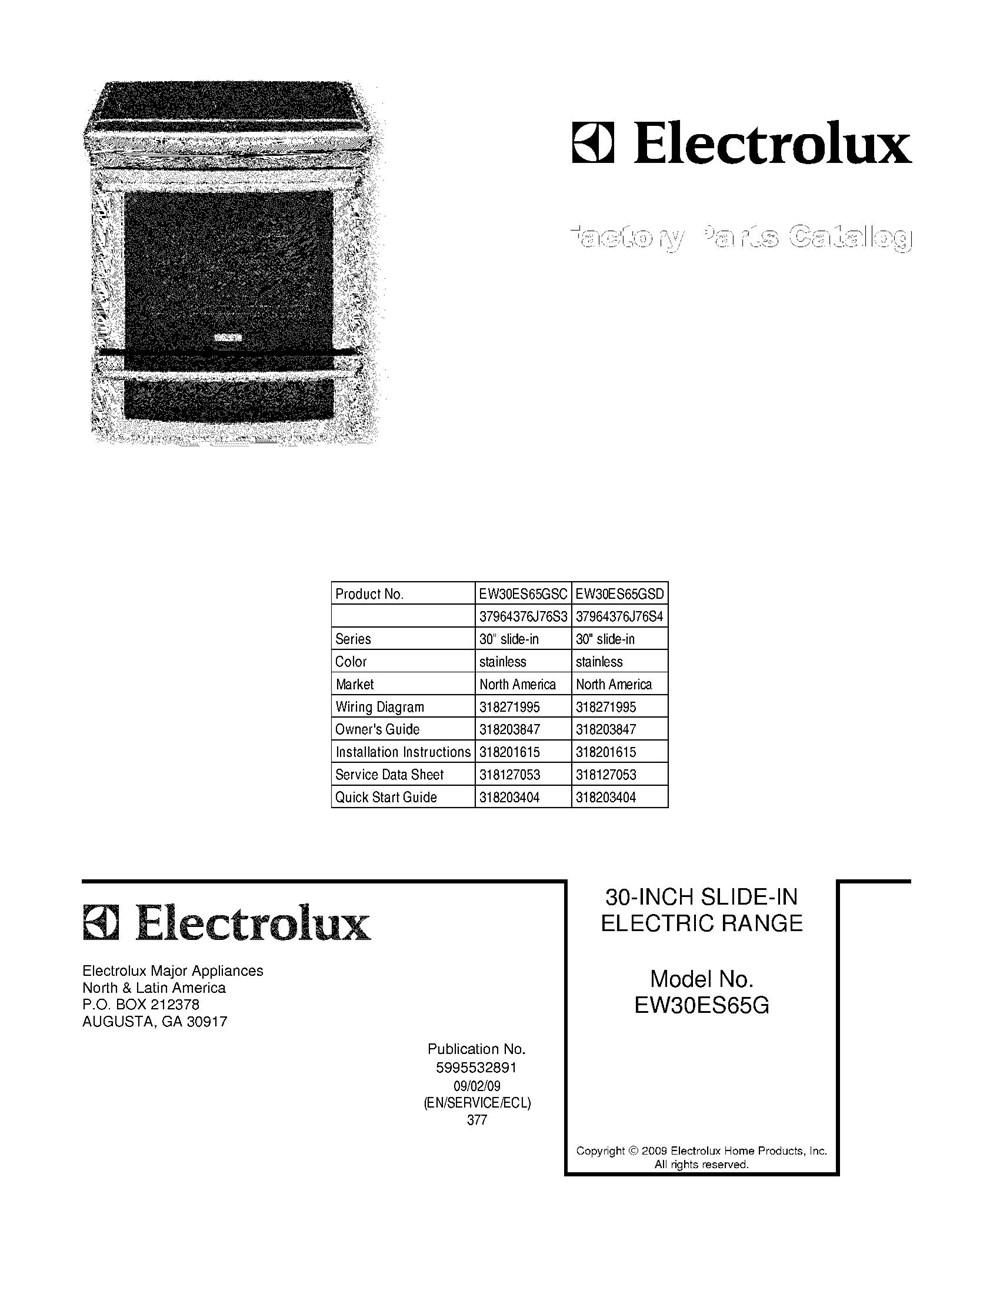 Ew30es65gsd Frigidaire Company Appliance Parts 07top Drawer 09door 01cover 10wiring Schematic 11wiring Diagram